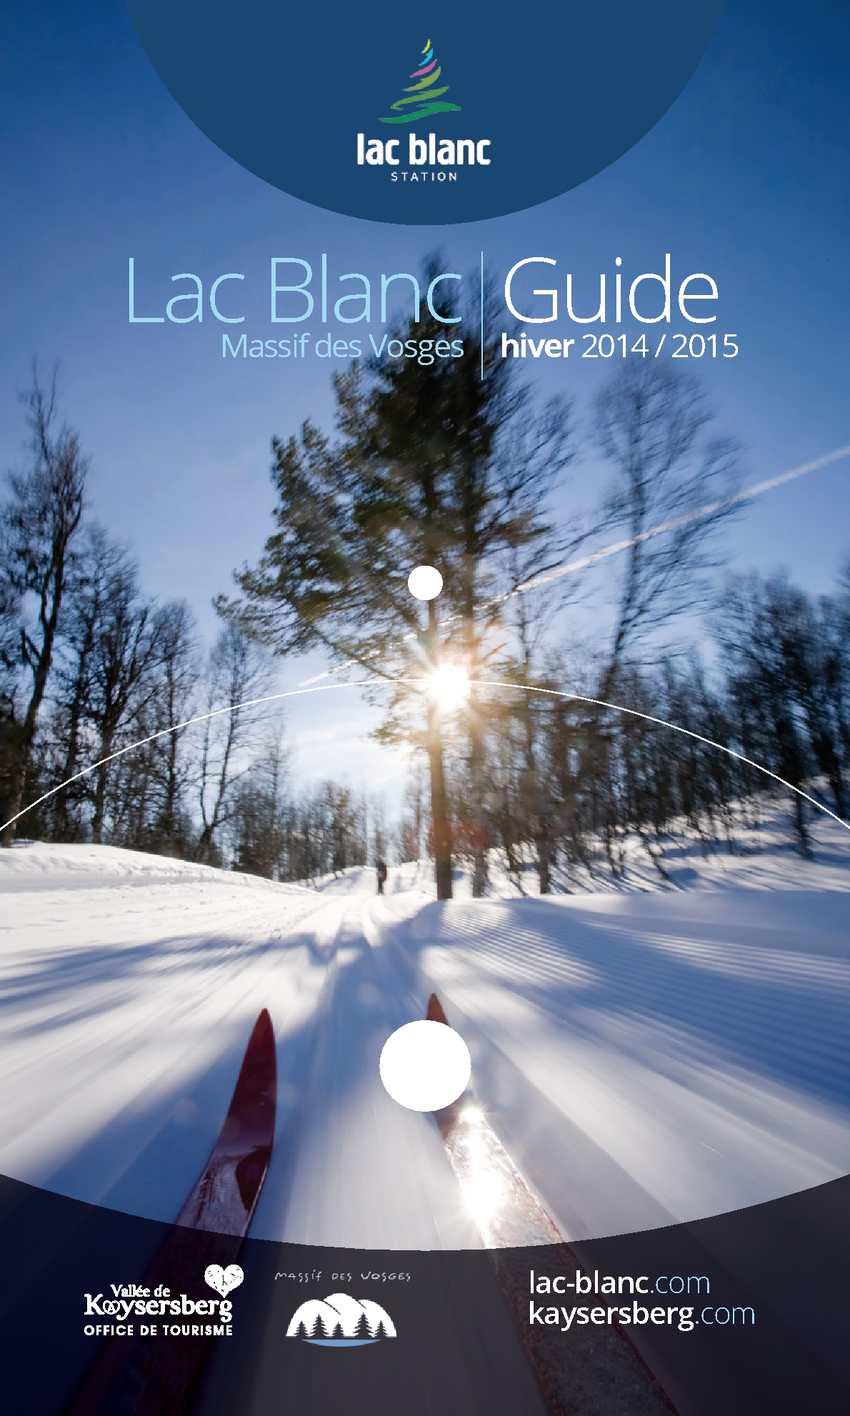 Calameo Guide Pratique Lac Blanc Hiver 2014 2015